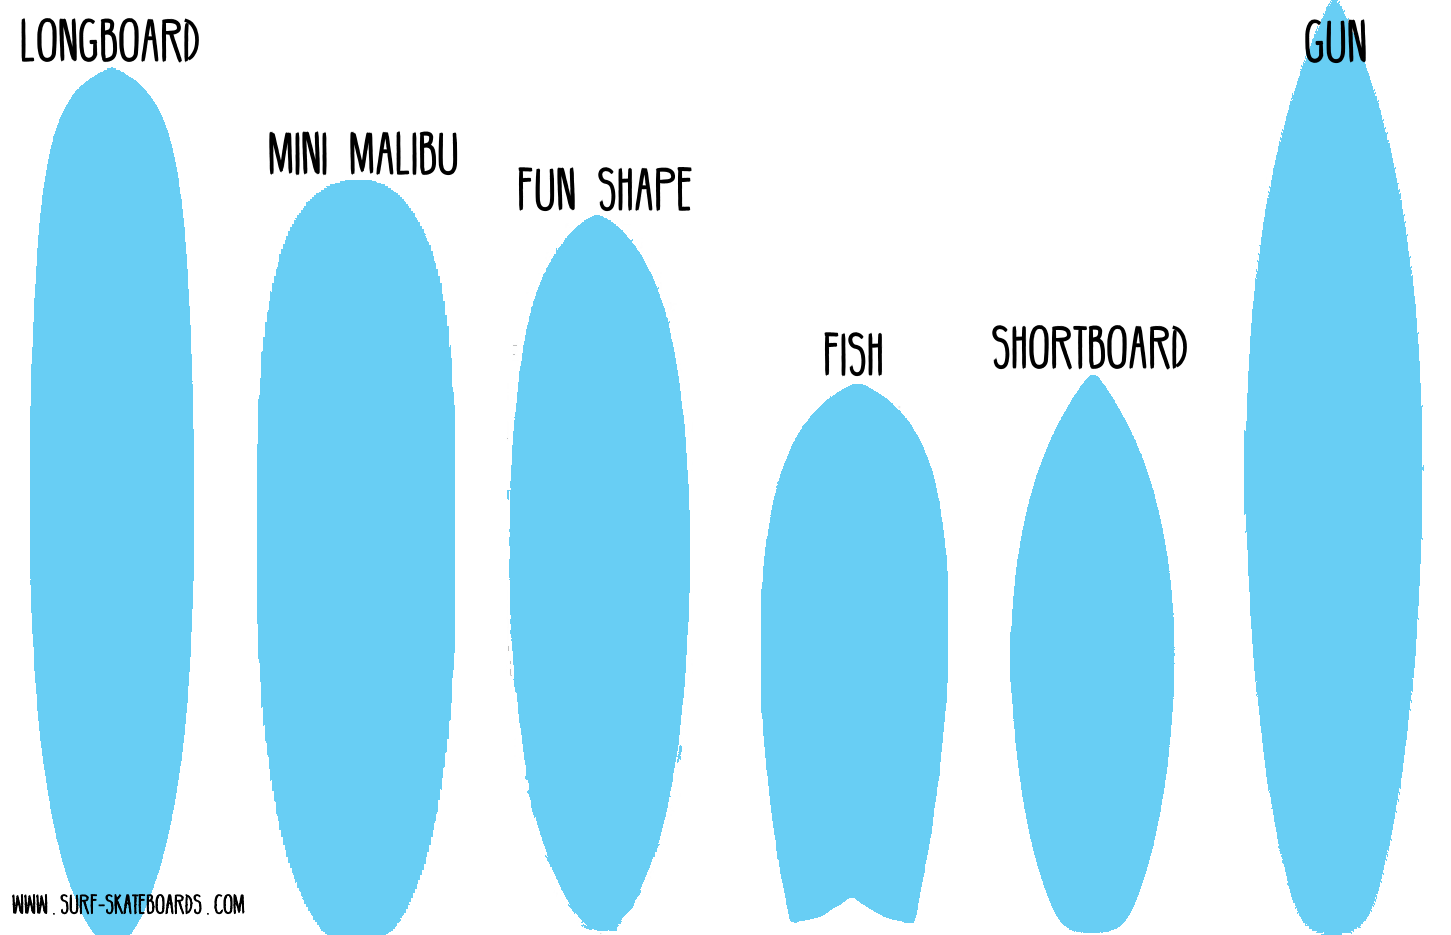 Surfboard Shapes Overview: Mini Malibu, Fish, Funboard, Longboard, Gun